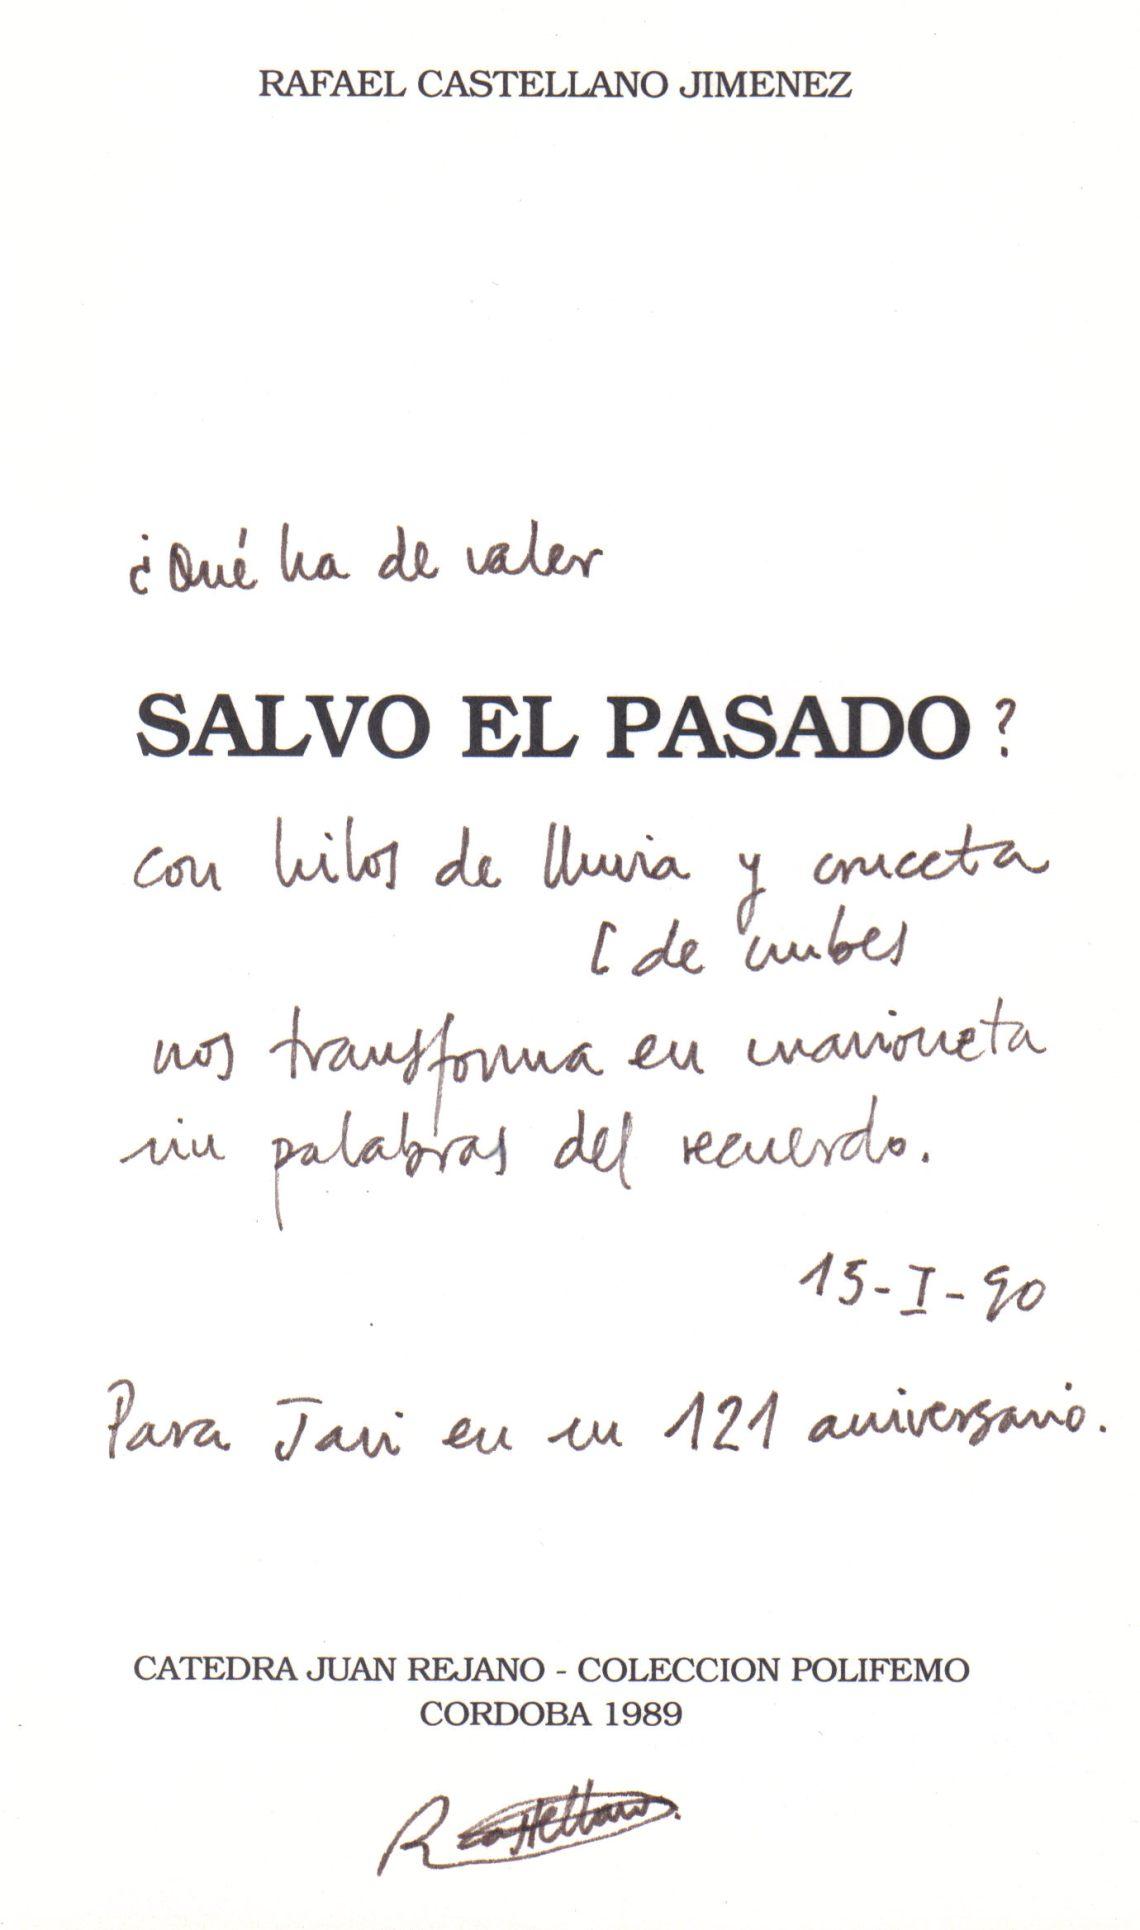 Javier Antón - Un poeta